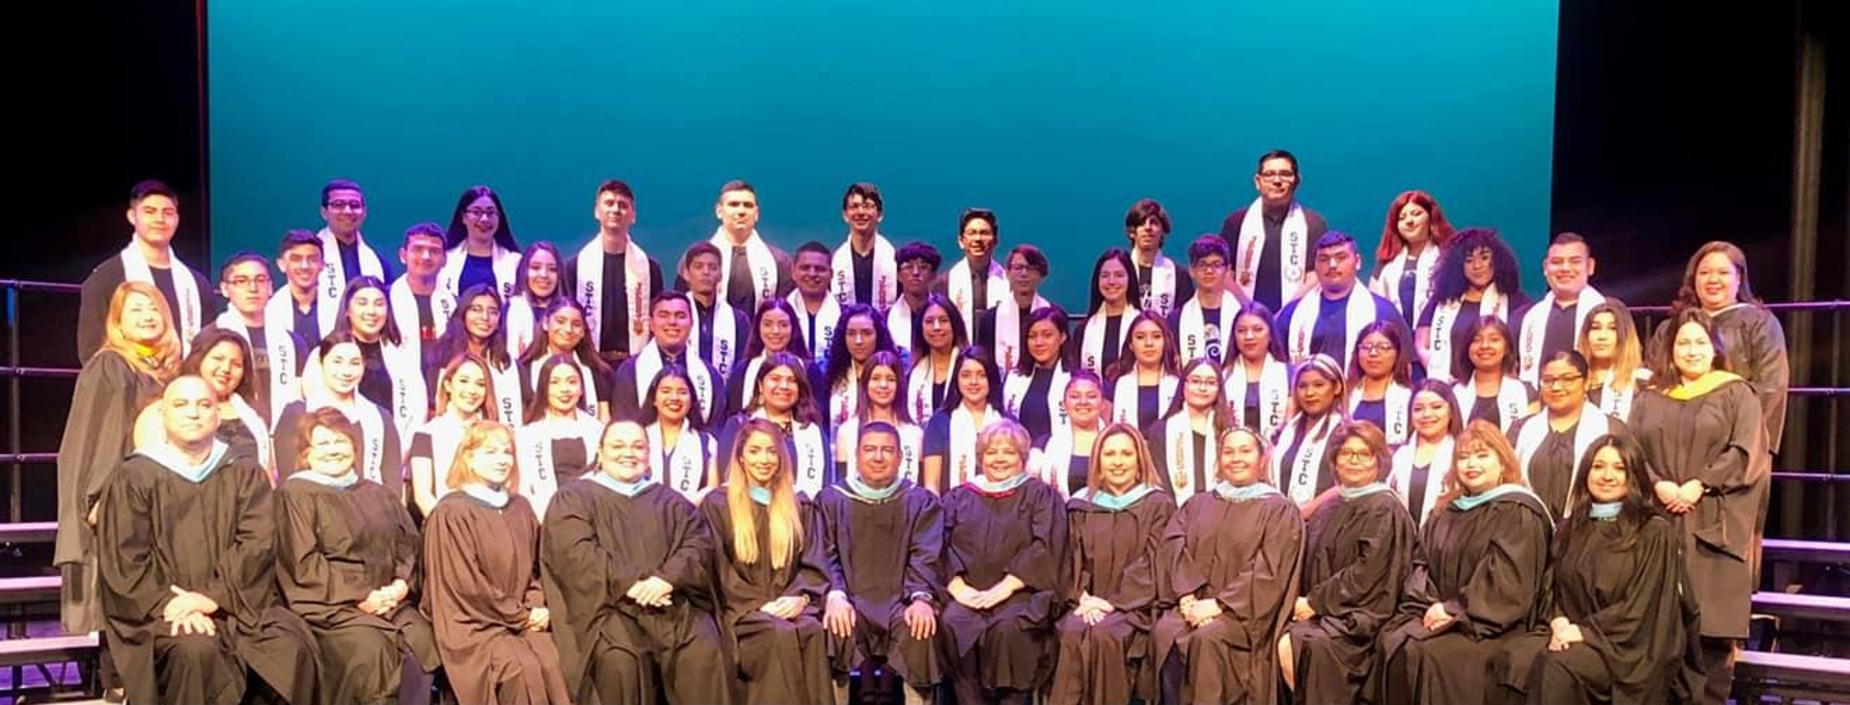 J. Economedes High School | STC/CTE Graduates